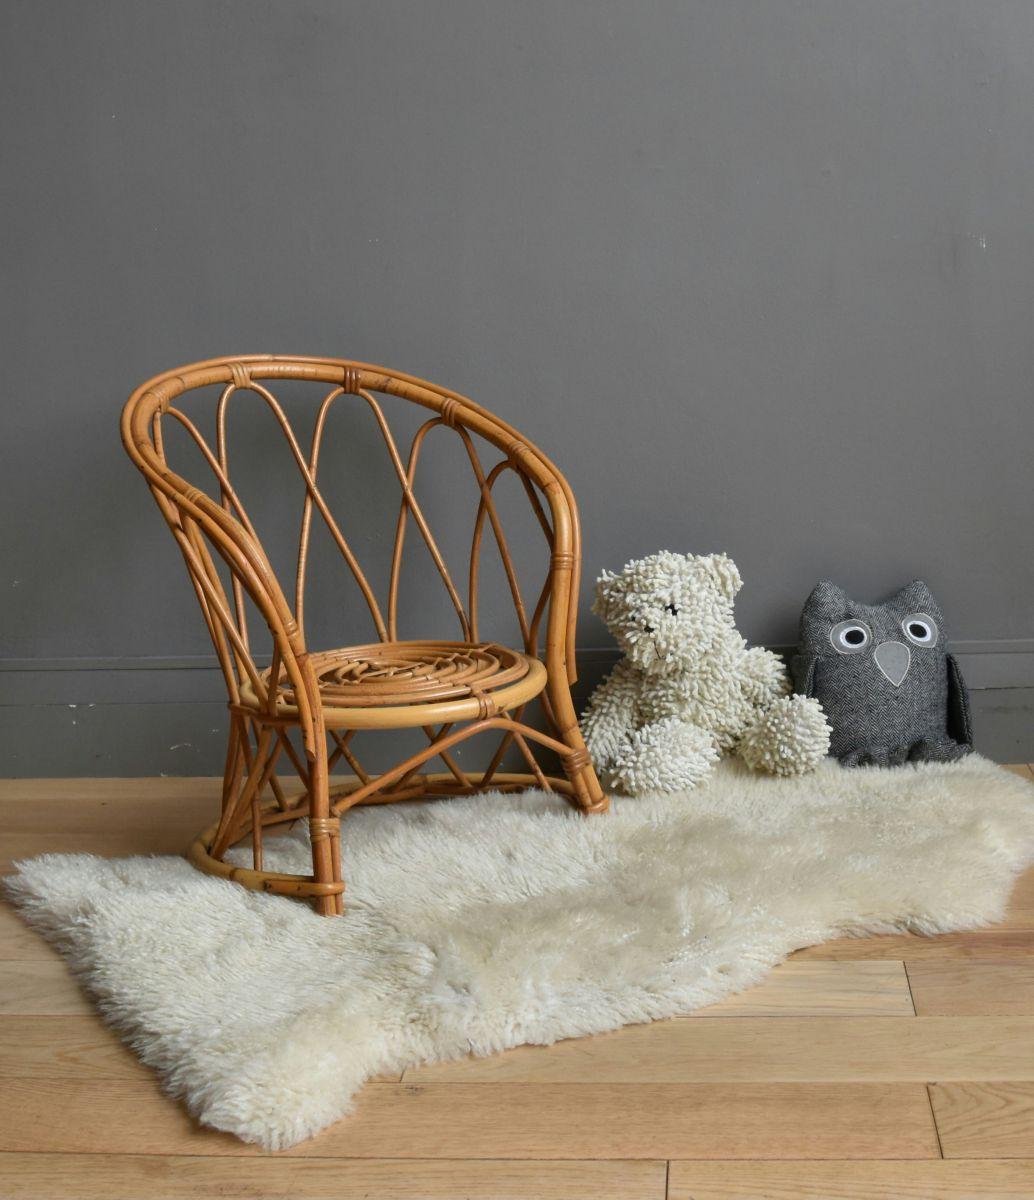 salon rotin pour veranda fauteuil rotin enfant vintage luckyfind - Salon Rotin Pour Veranda